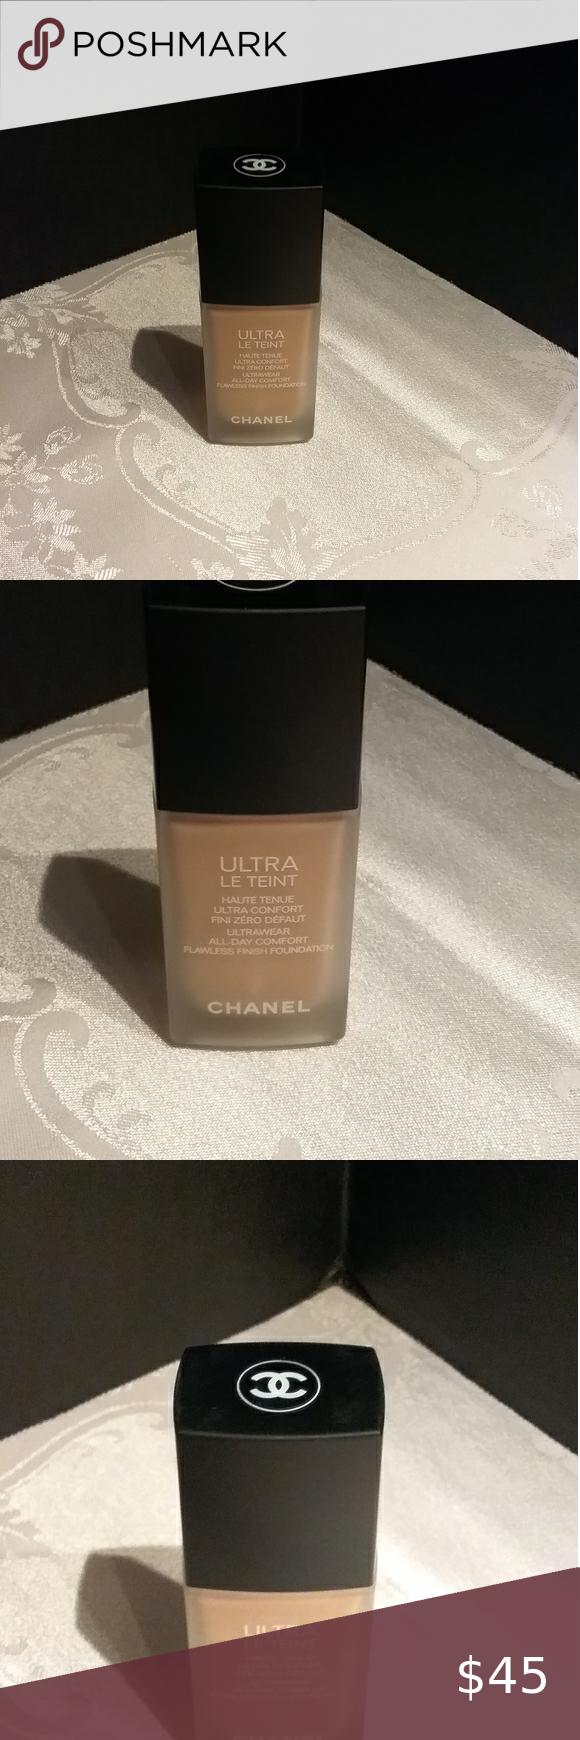 Chanel Ultra Le Teint Haute Tenue Foundation BD41 NWT in